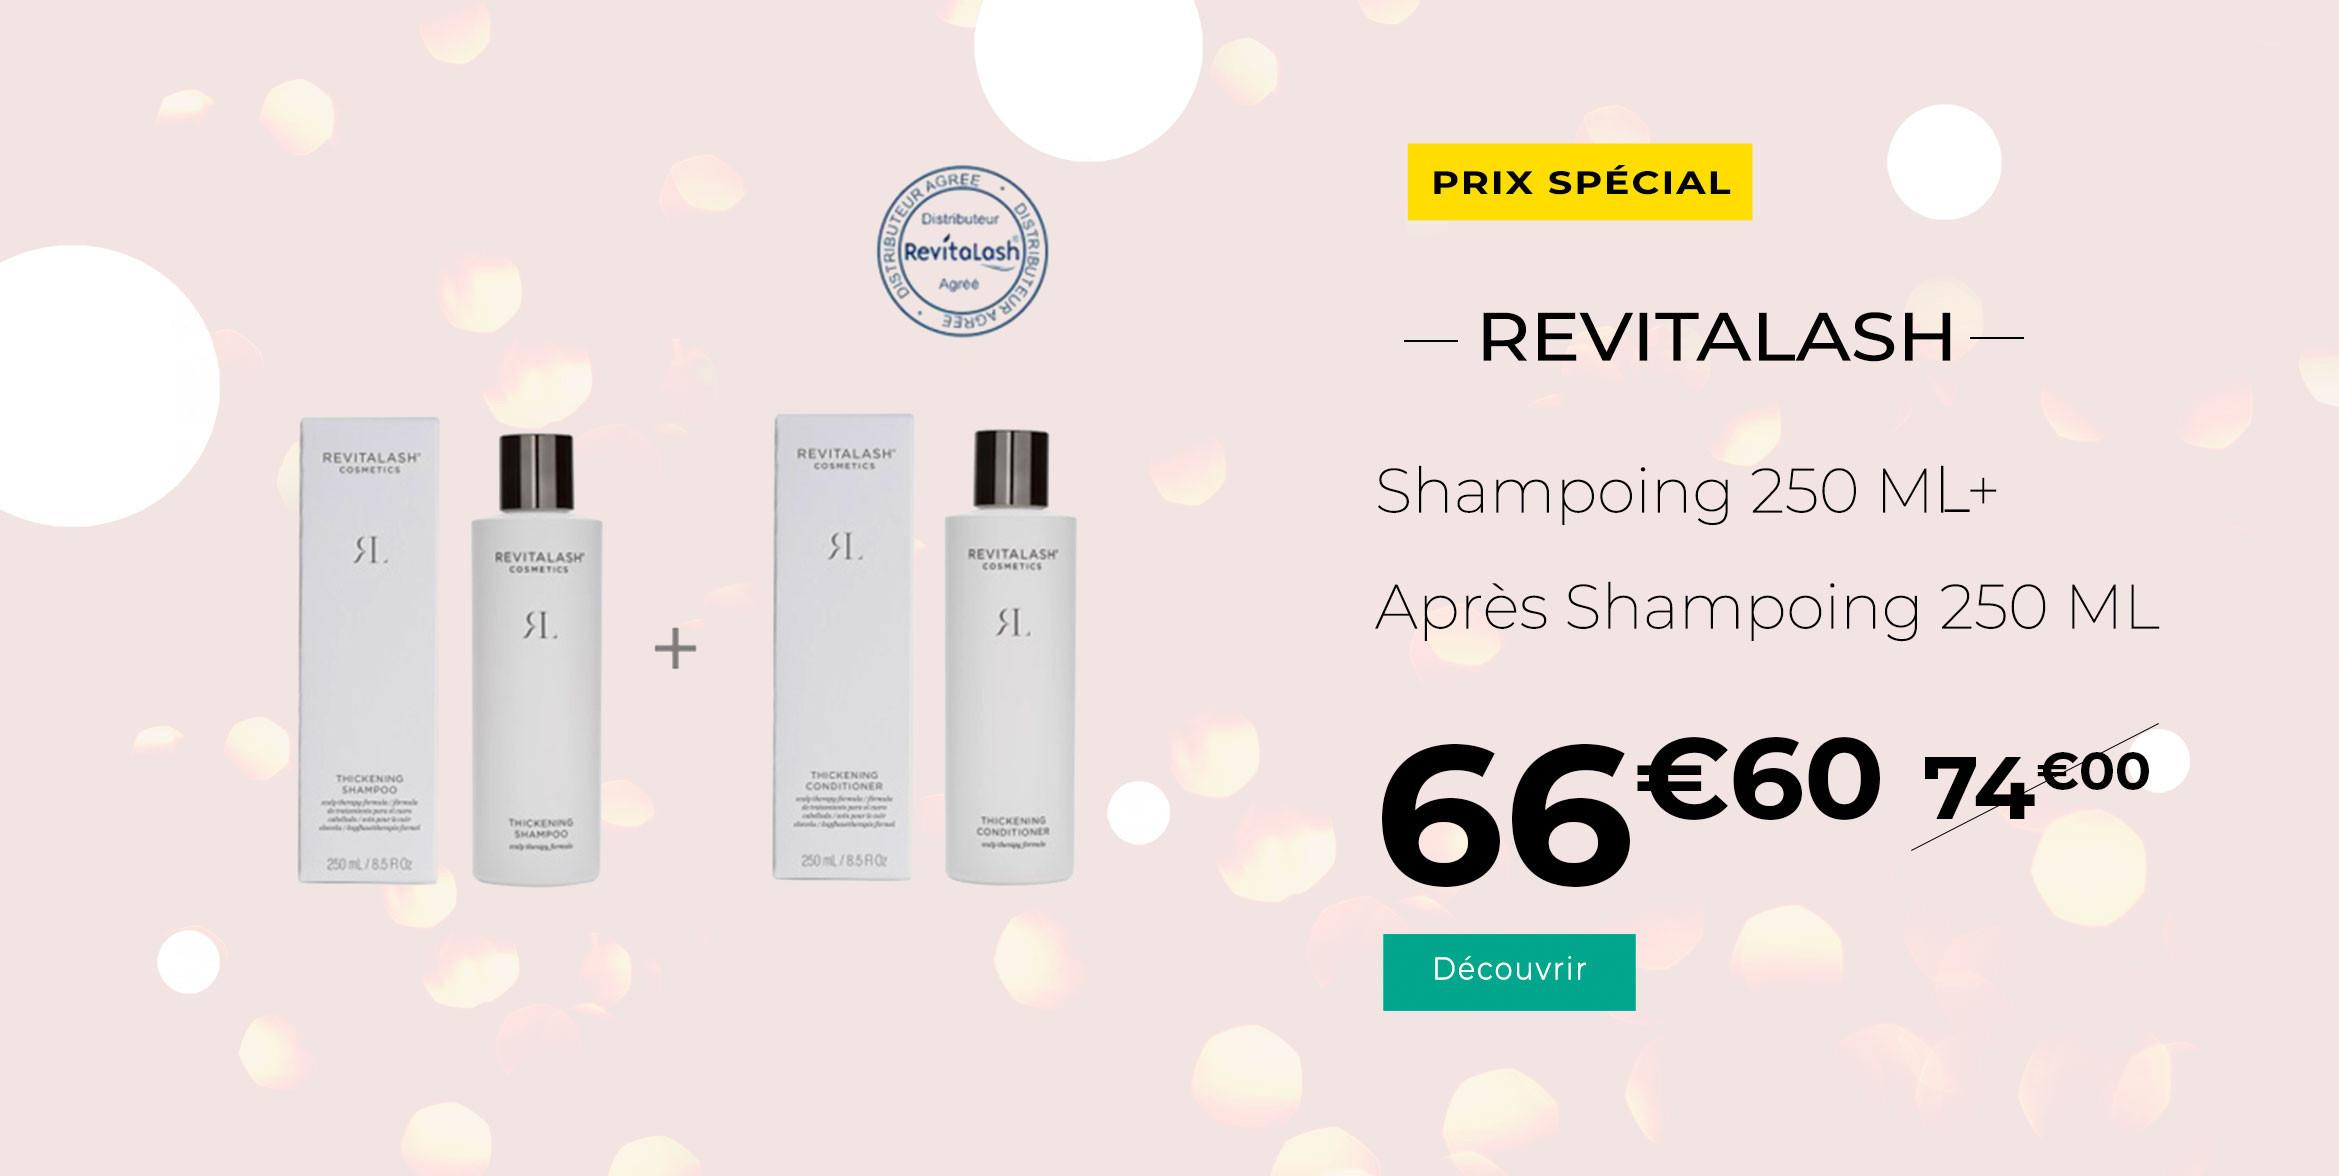 Revitalash pack promo Shampoing + Après Shampoing